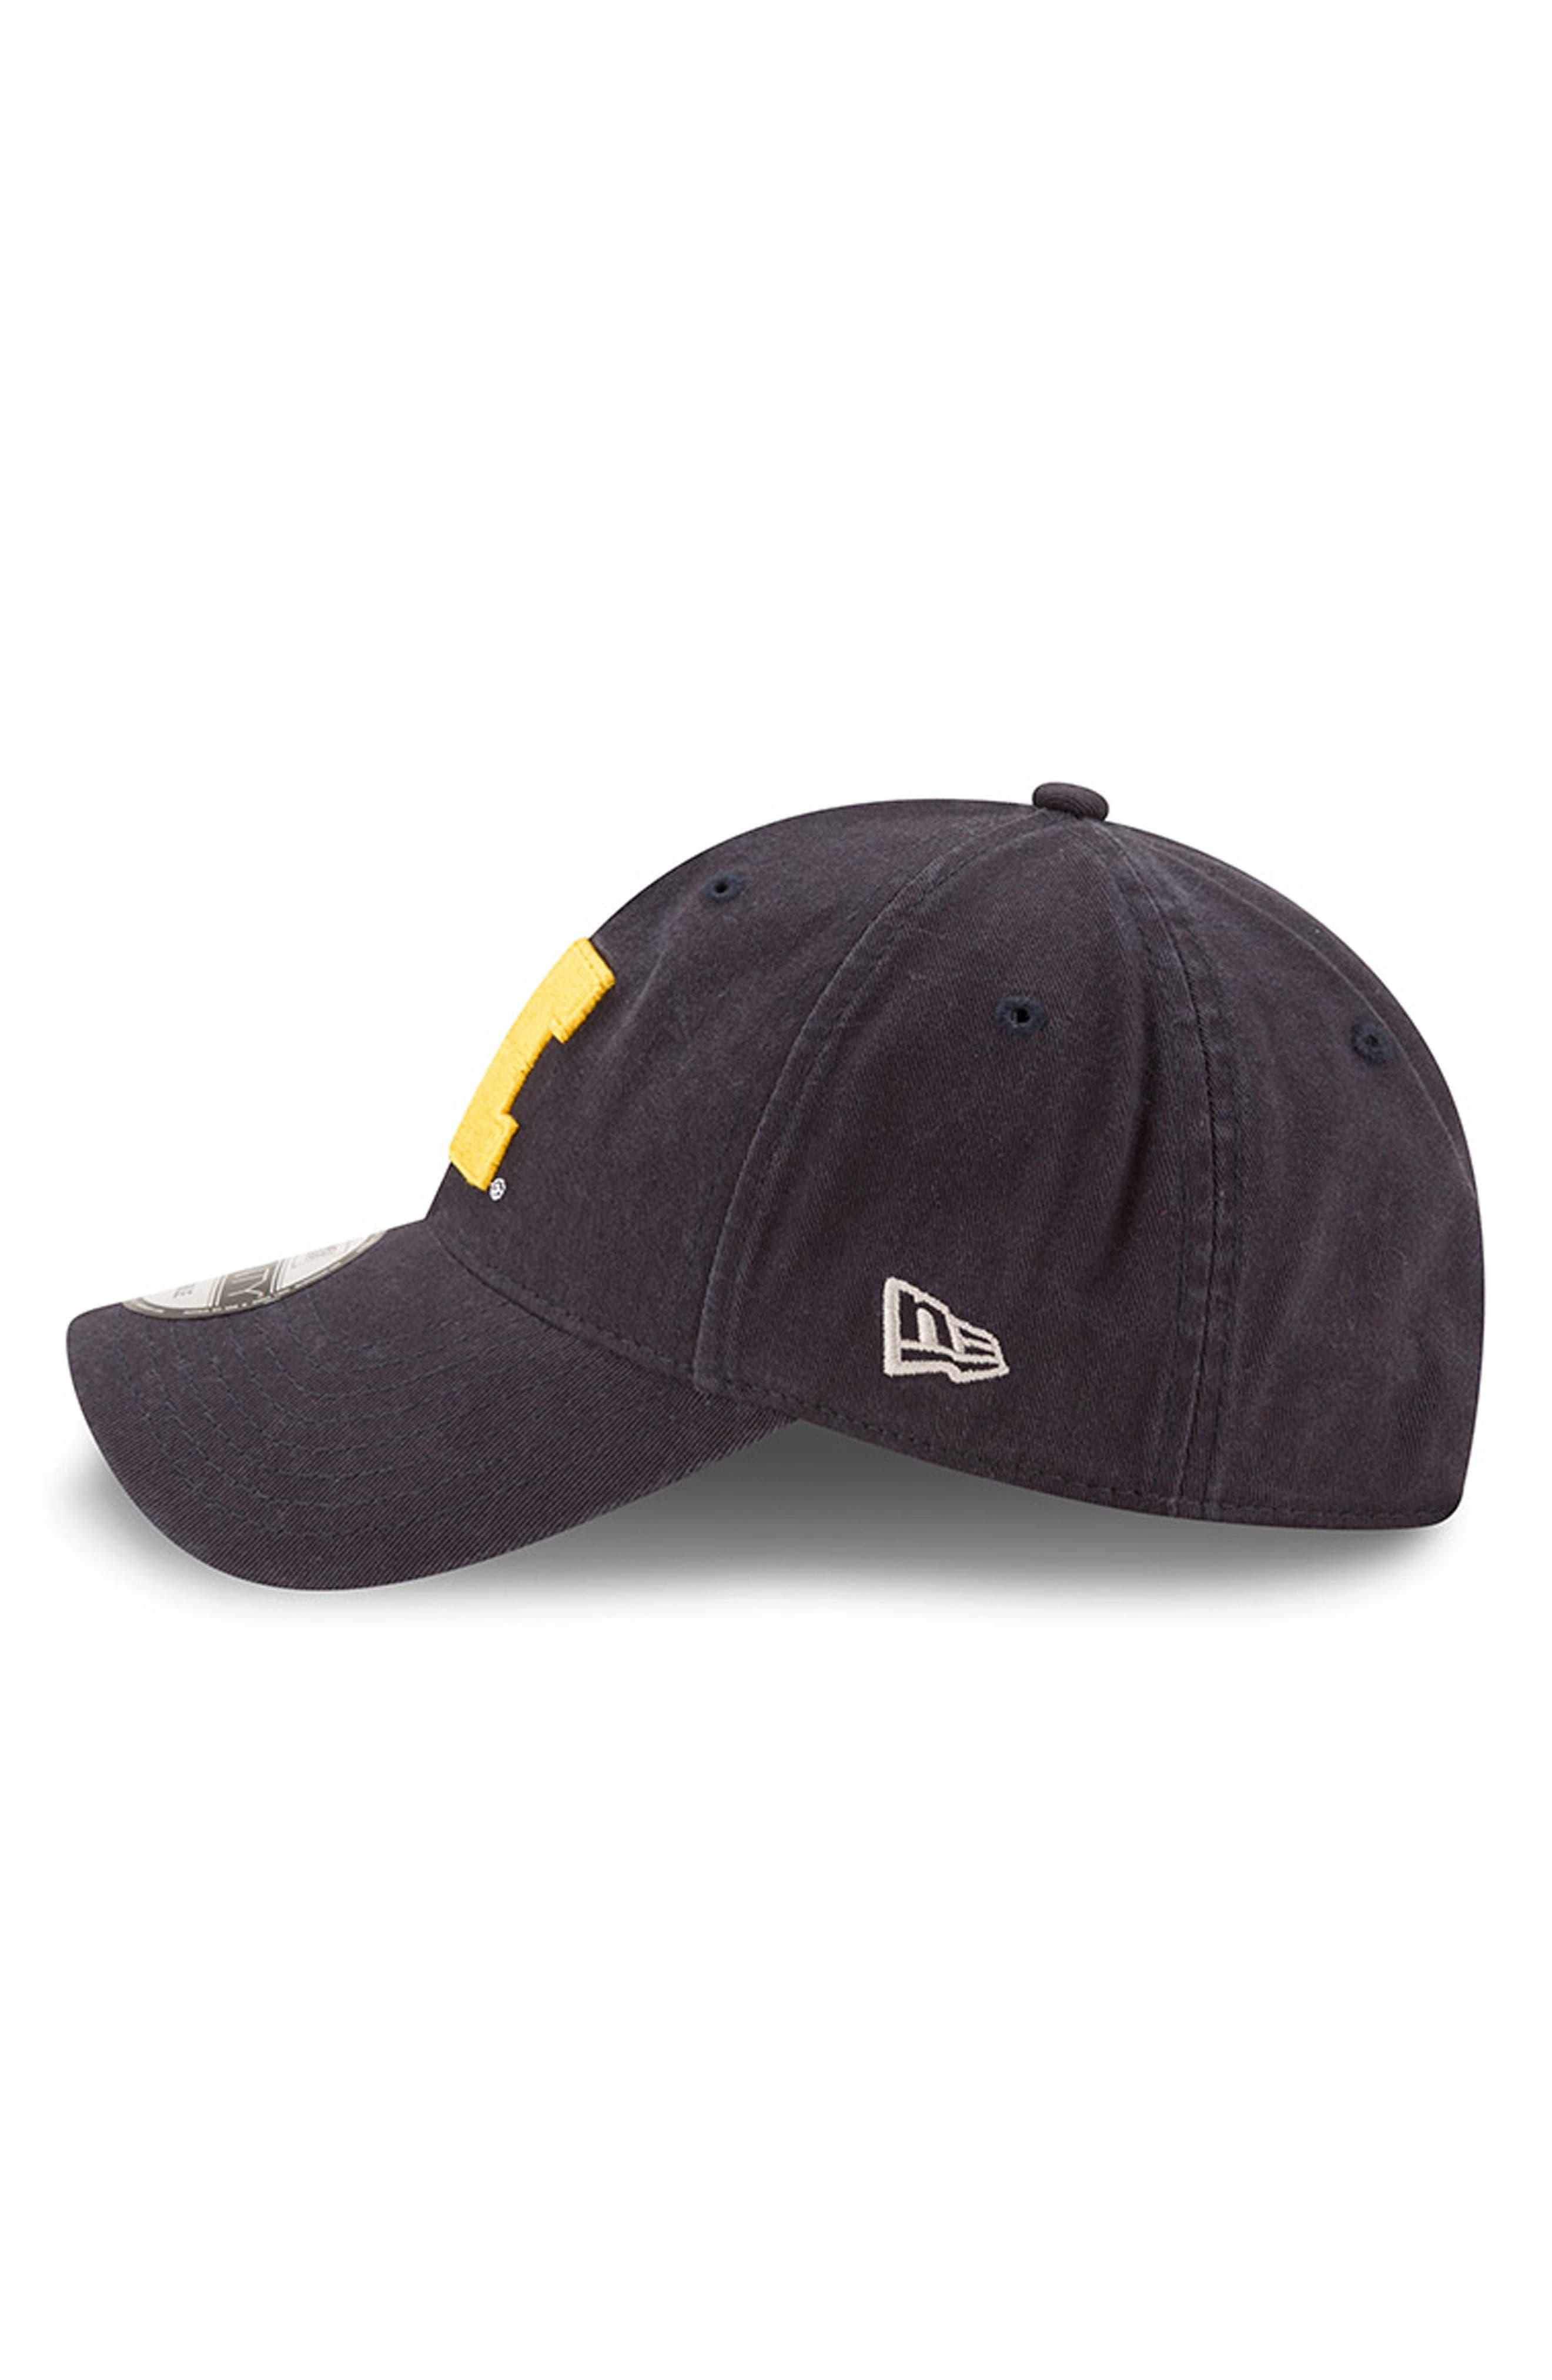 New Era Collegiate Core Classic - Michigan Wolverines Baseball Cap,                             Alternate thumbnail 3, color,                             Michigan Wolverines